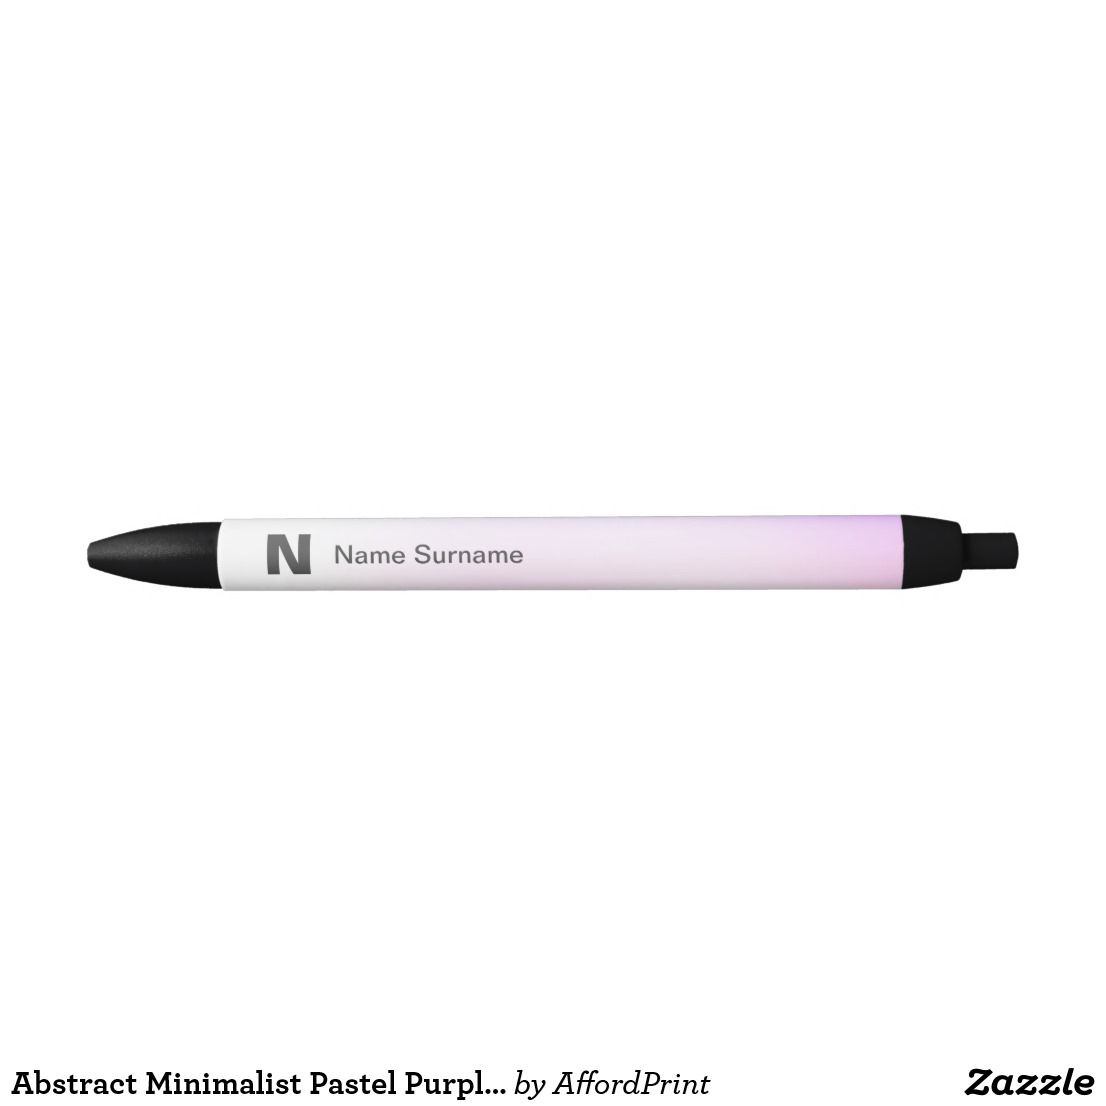 Abstract Minimalist Pastel Purple Pink Gra Nt Black Ink